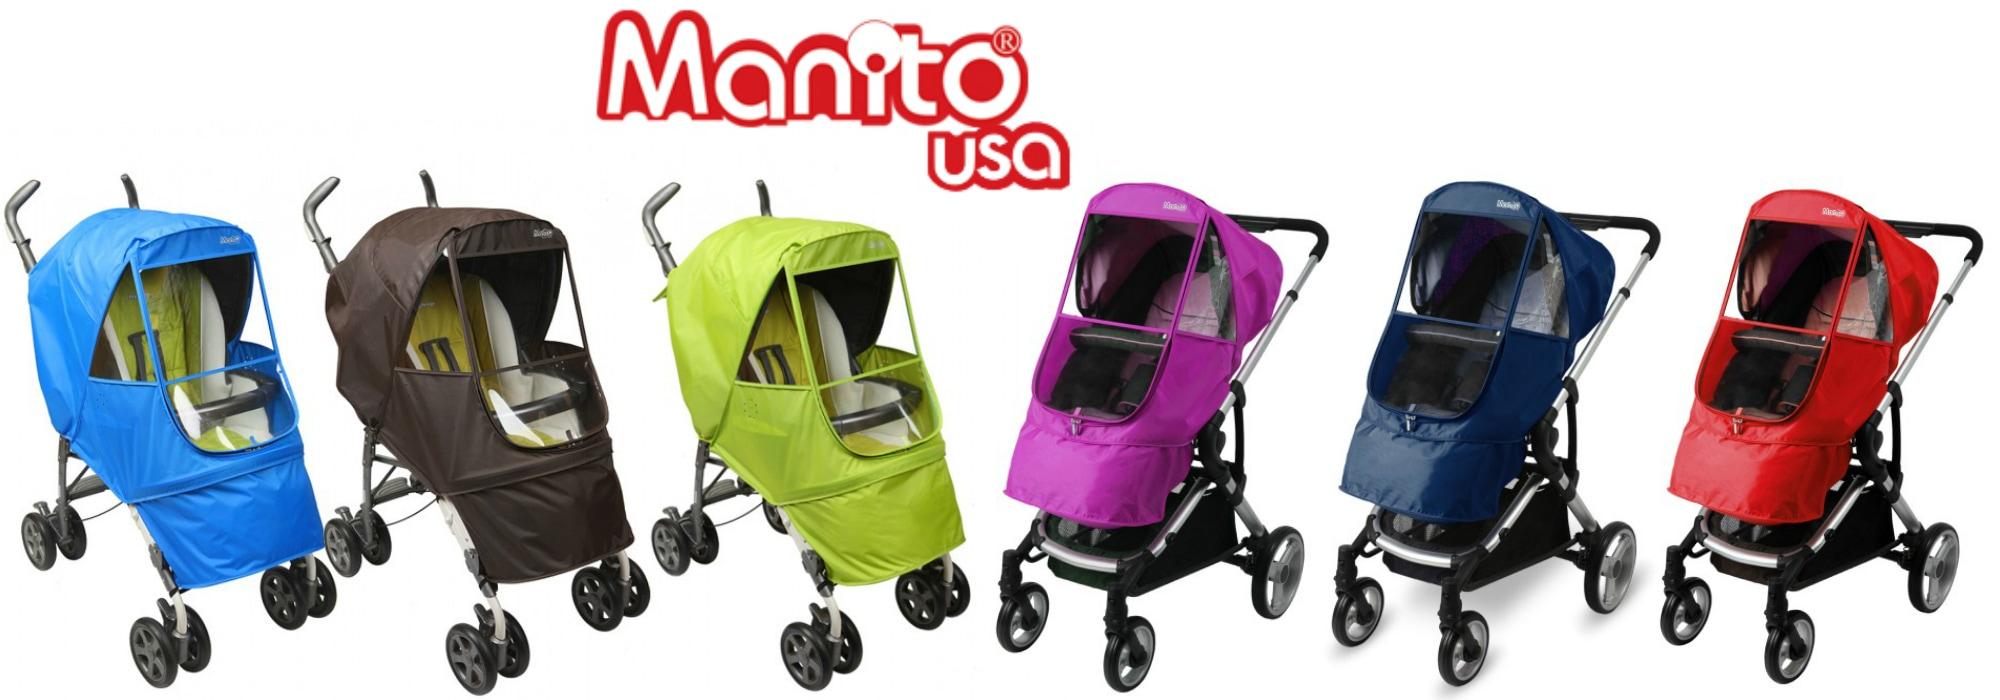 Win a Manito Elegance Stroller Shield in US Japan Fam's $500 value